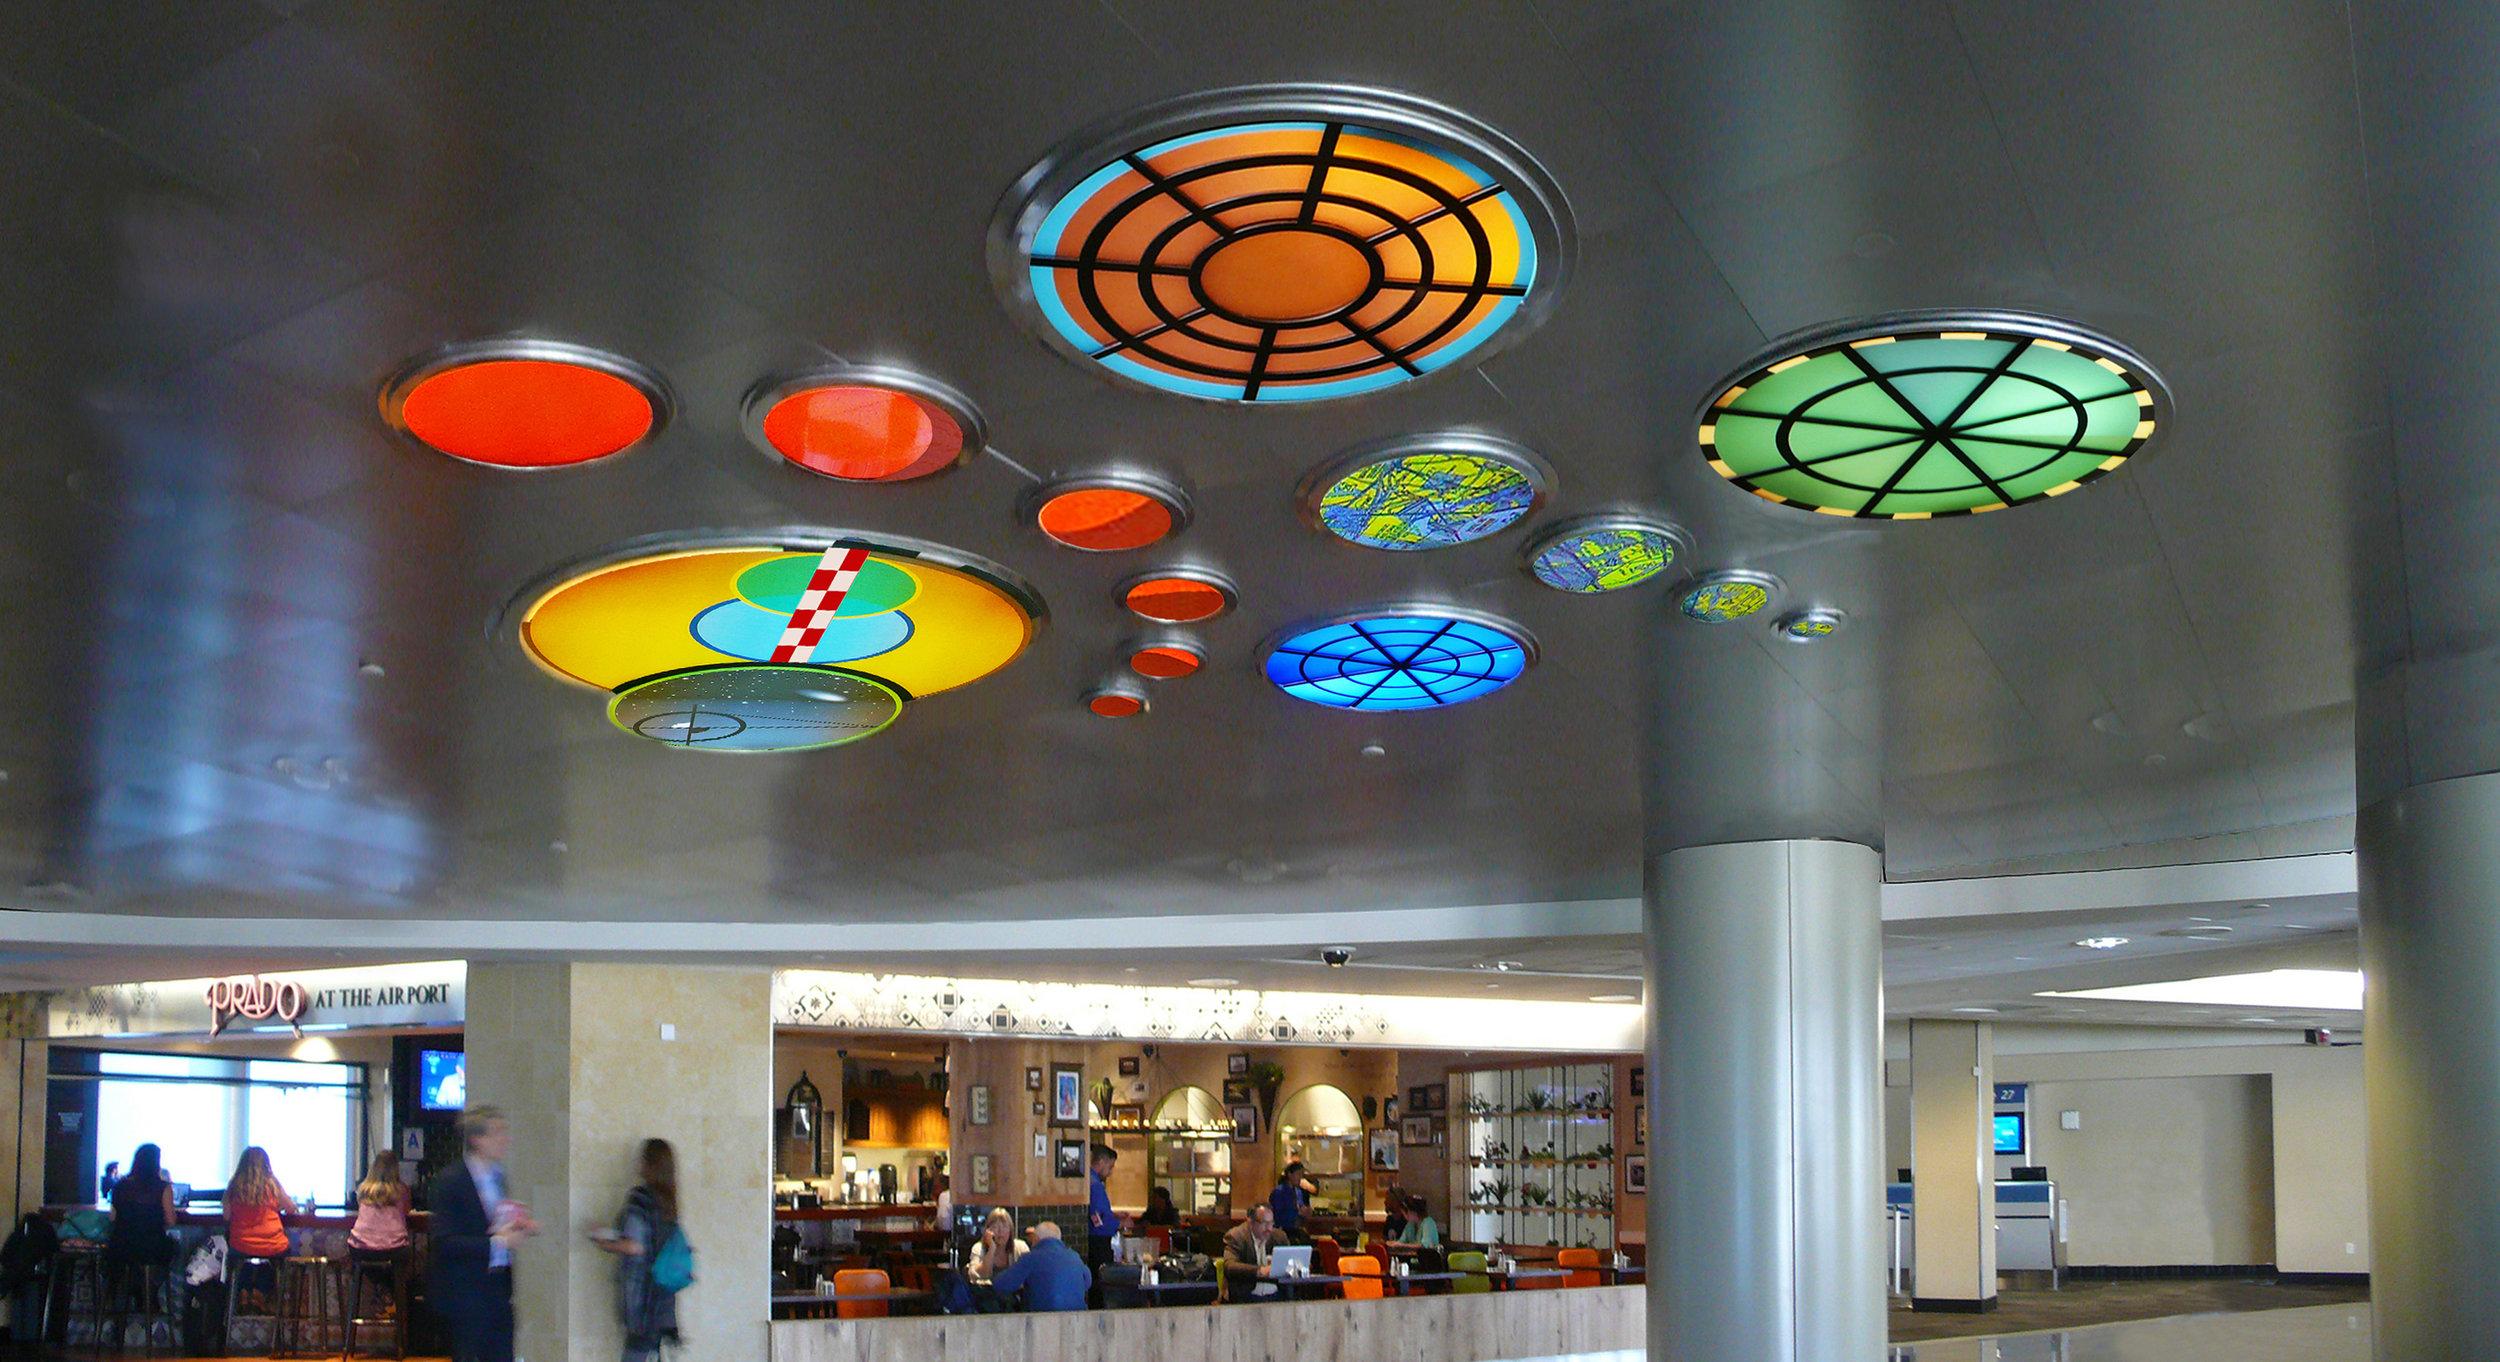 San Diego International Airport Terminal 2